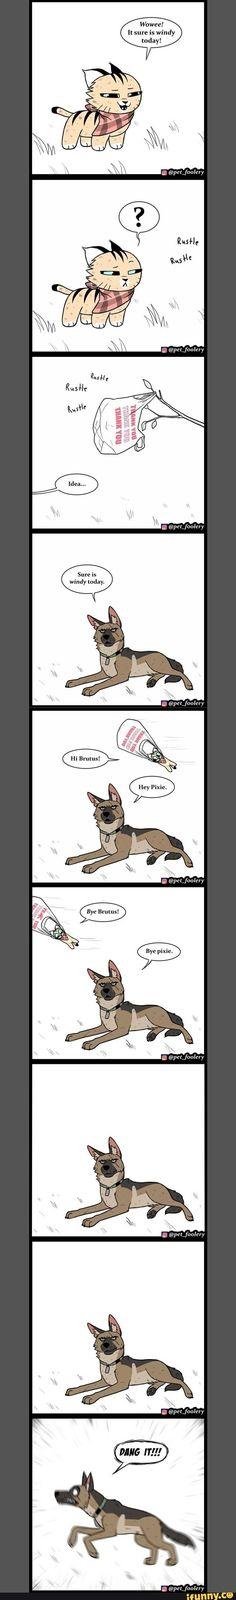 Funny Animal Comics, Cat Comics, Funny Animal Memes, Cute Funny Animals, Funny Comics, Funny Cute, Really Funny Memes, Stupid Funny Memes, Funny Texts